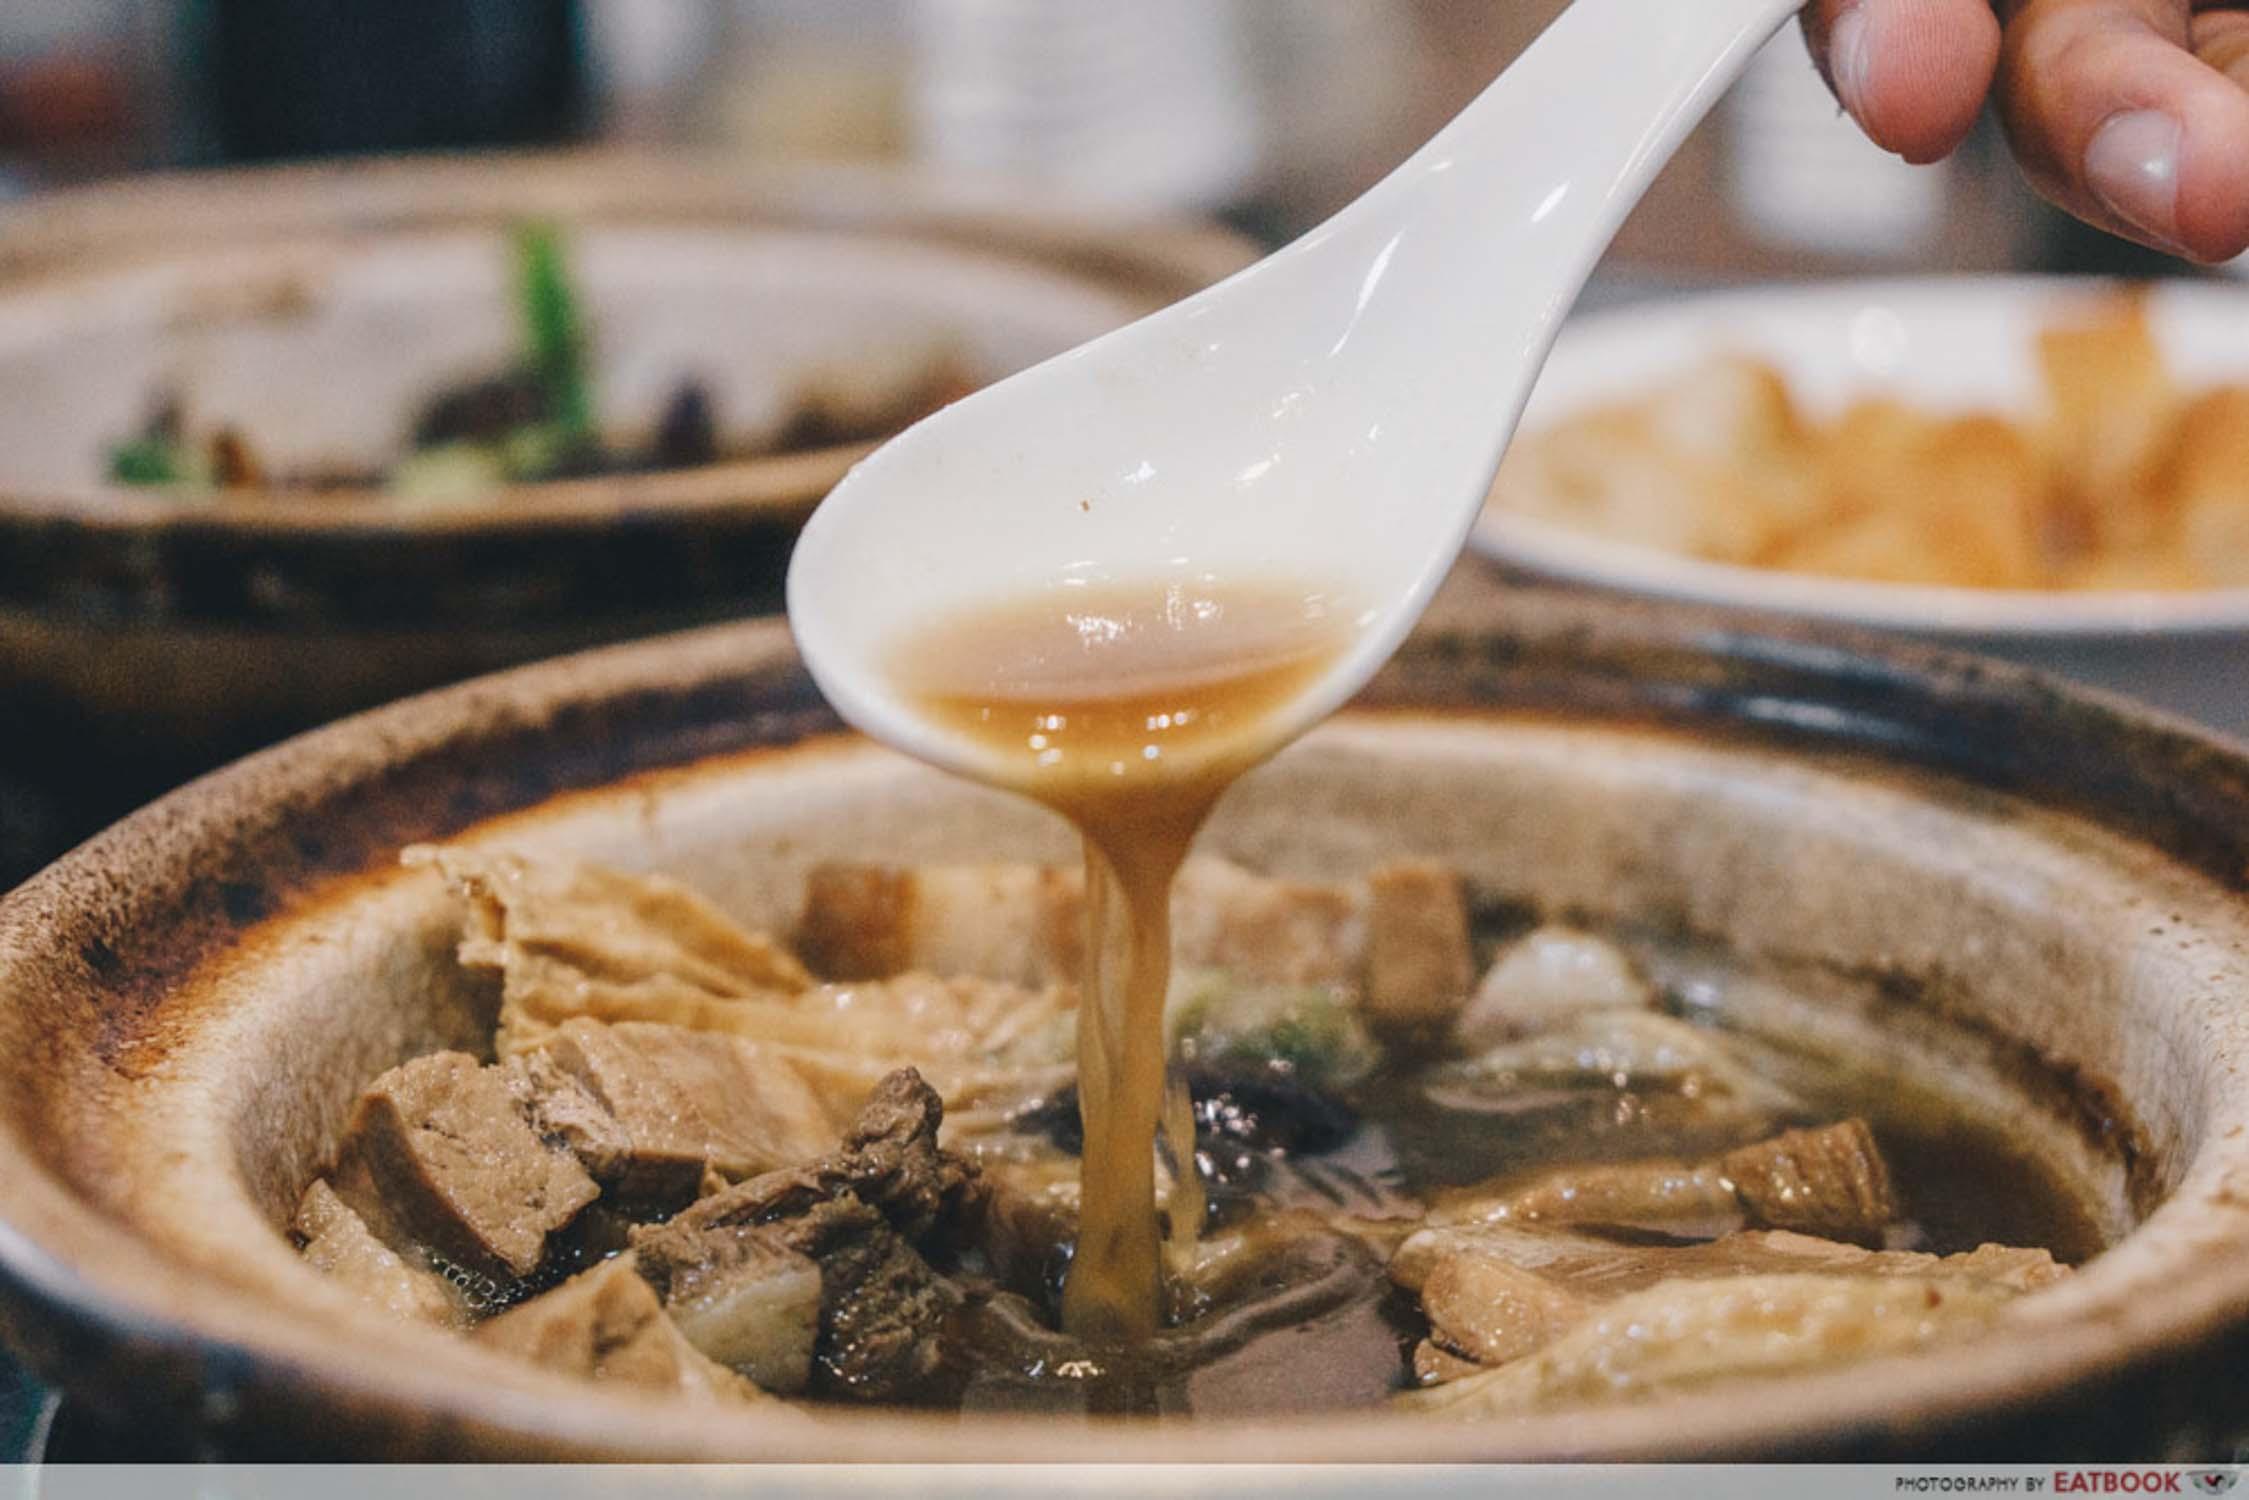 Good Taste Bak Kut Teh - Bak Kut Teh Soup Closeup